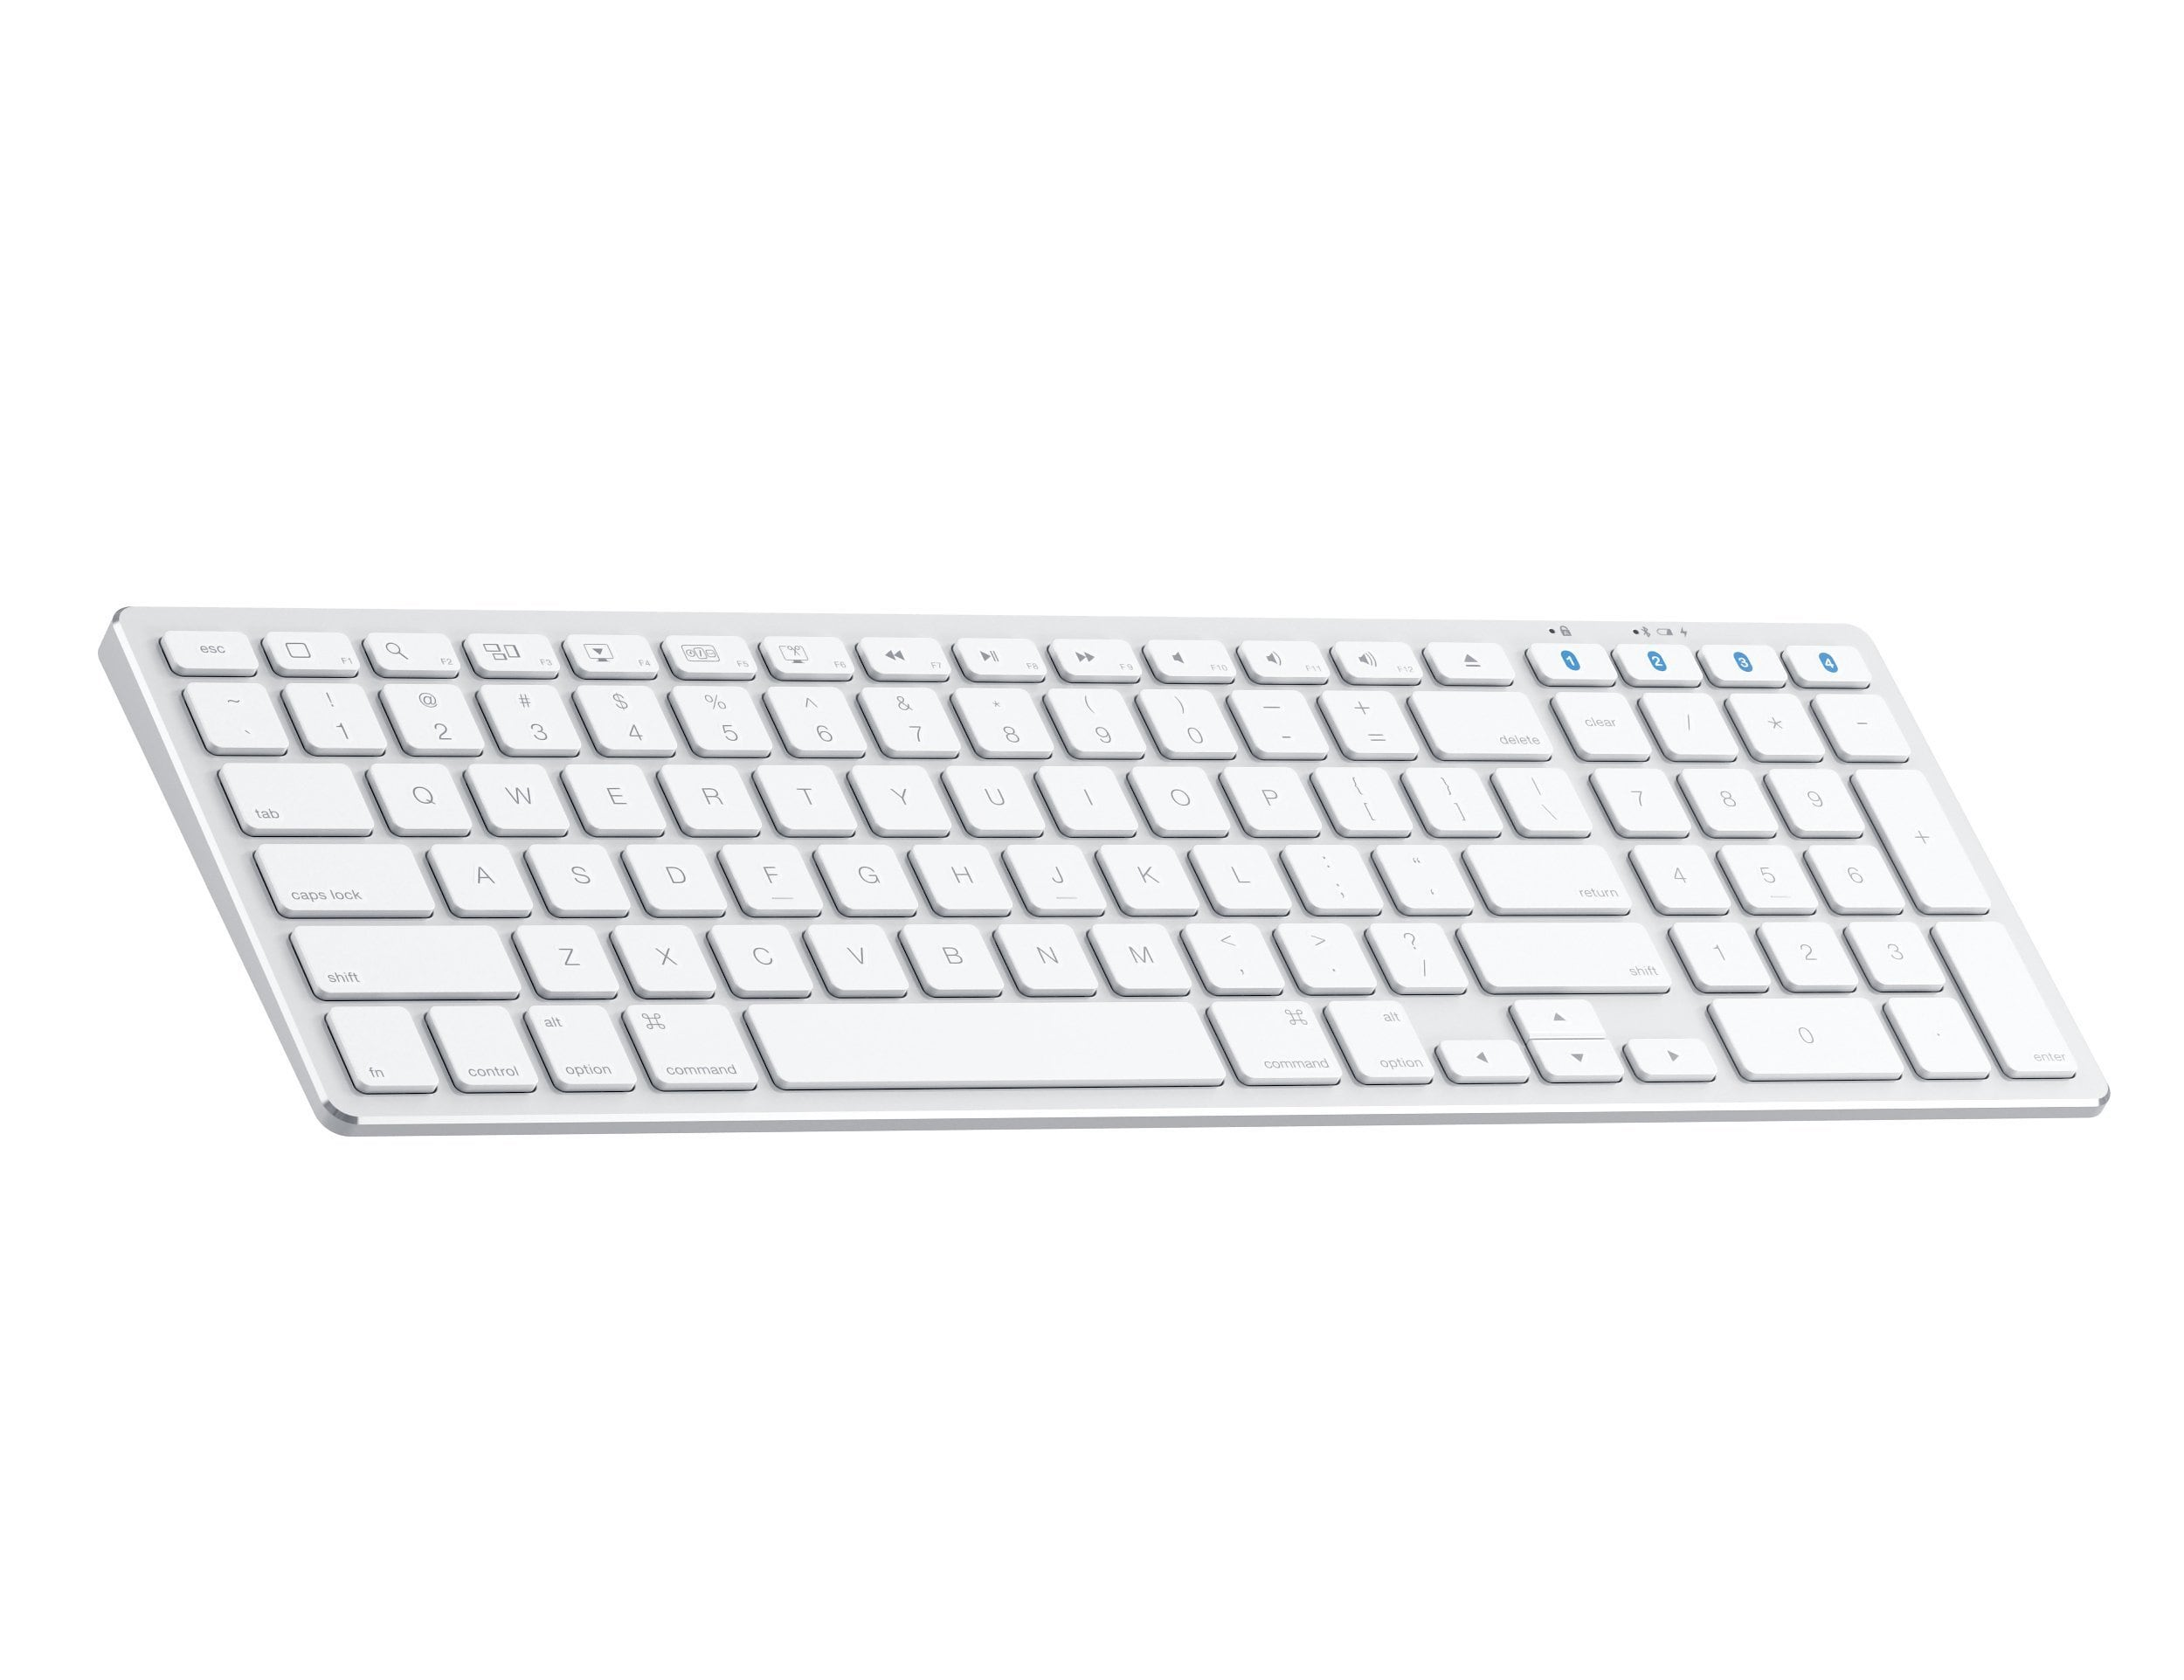 The Aluminum Slim Wireless Keyboard adds a full keyboard